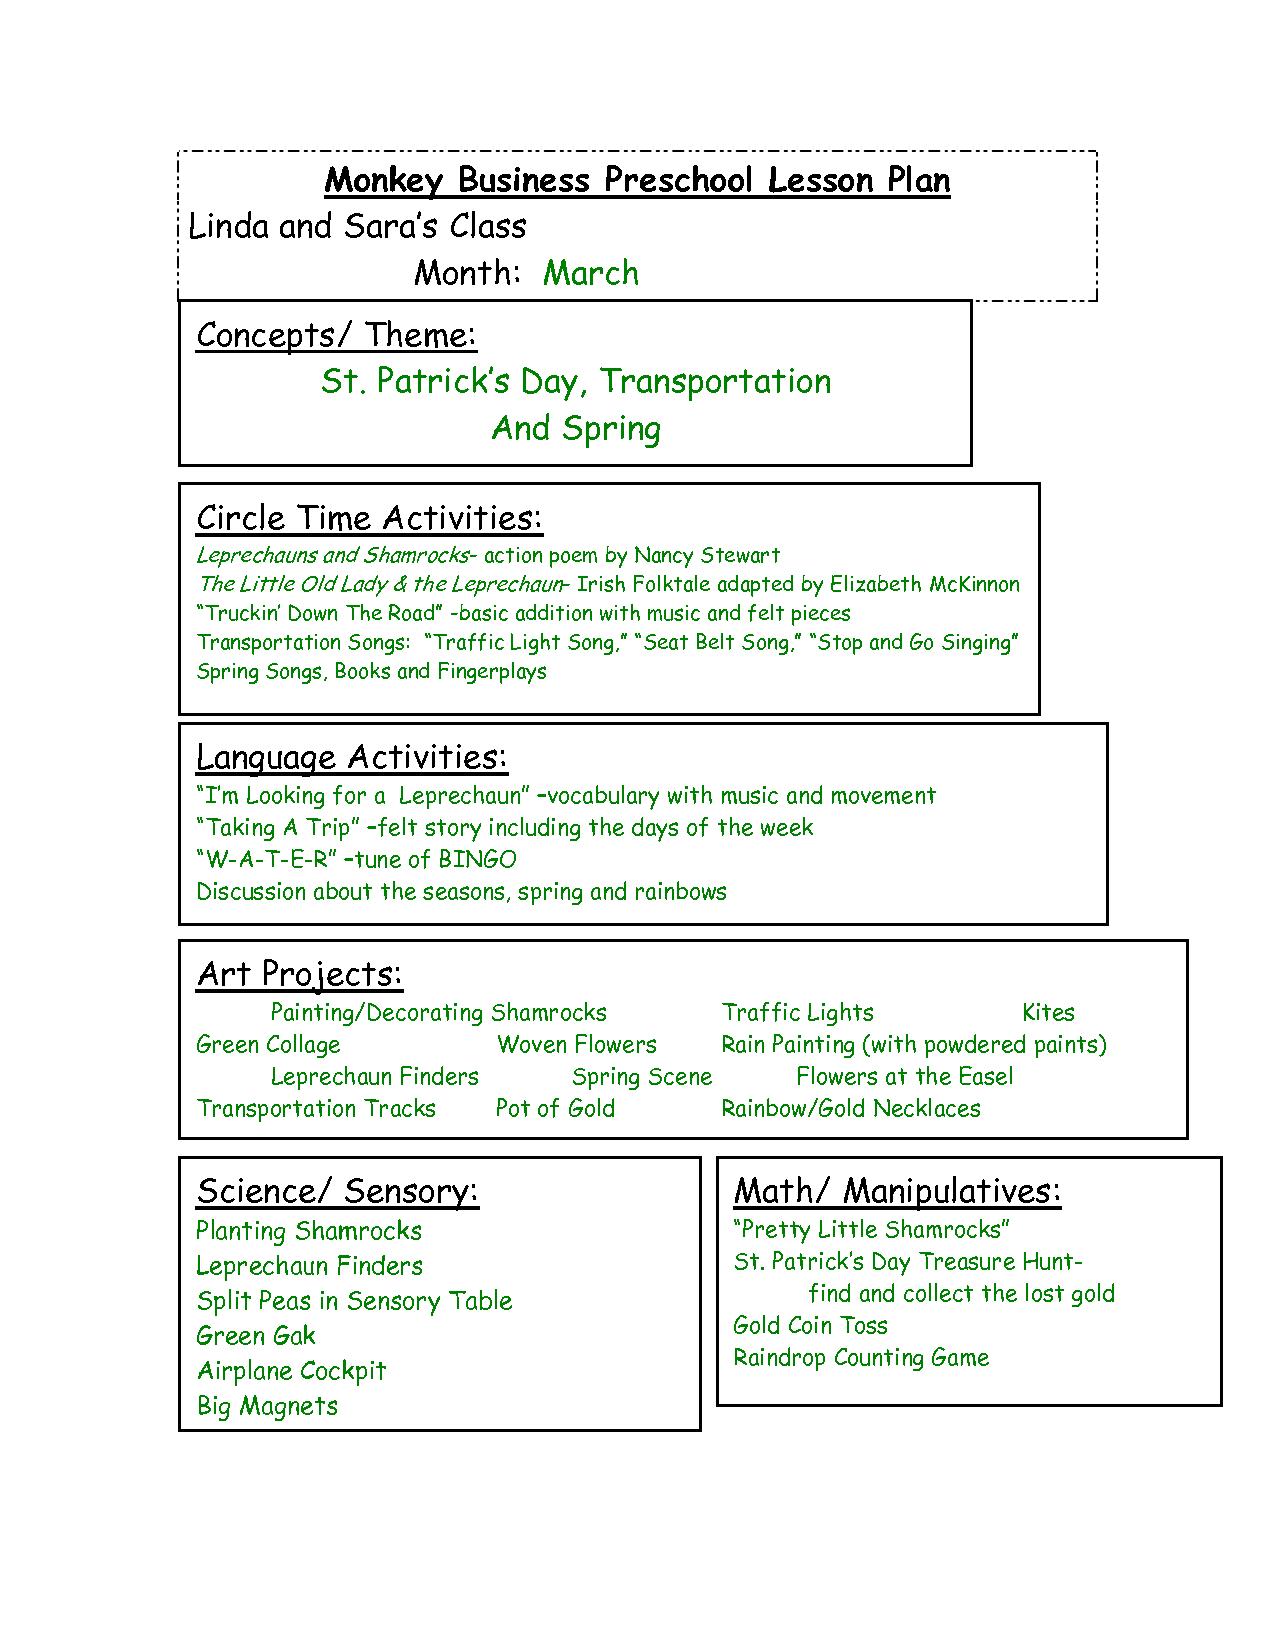 Themes Units Preschool Lesson Plans Monkey Business Preschool Lesson Plan Linda And Sara S